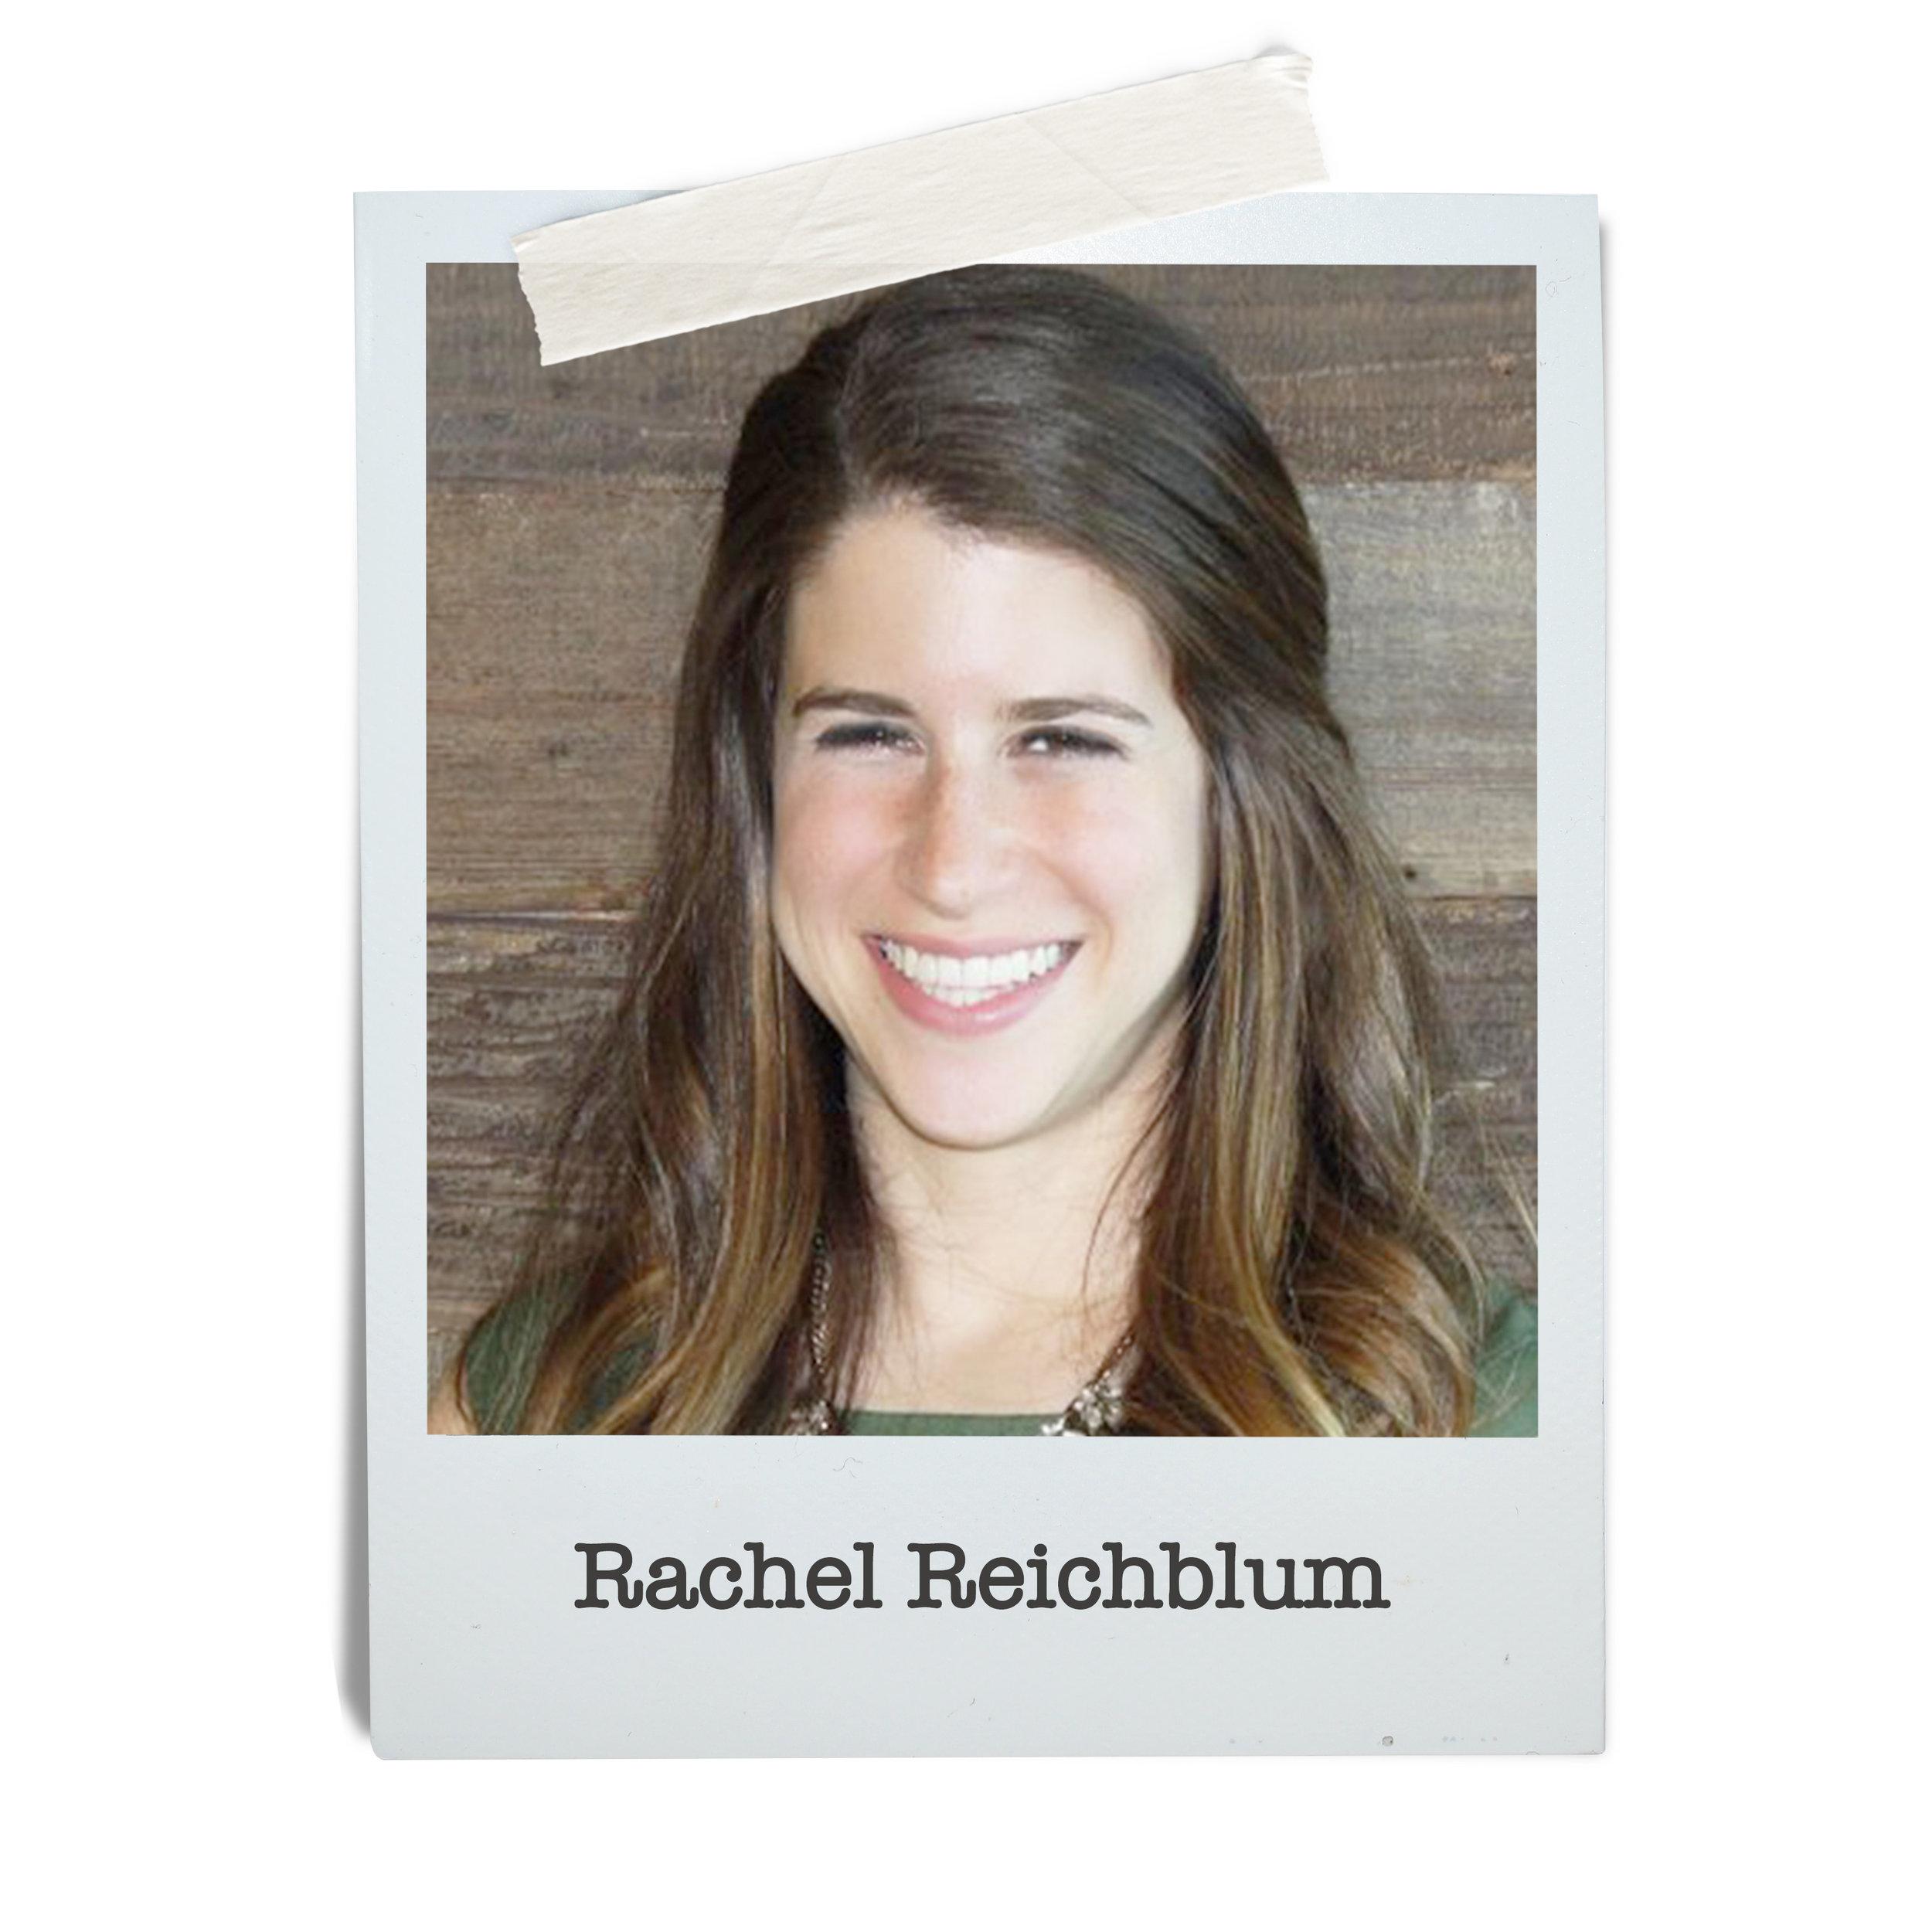 Rachel Reichblum